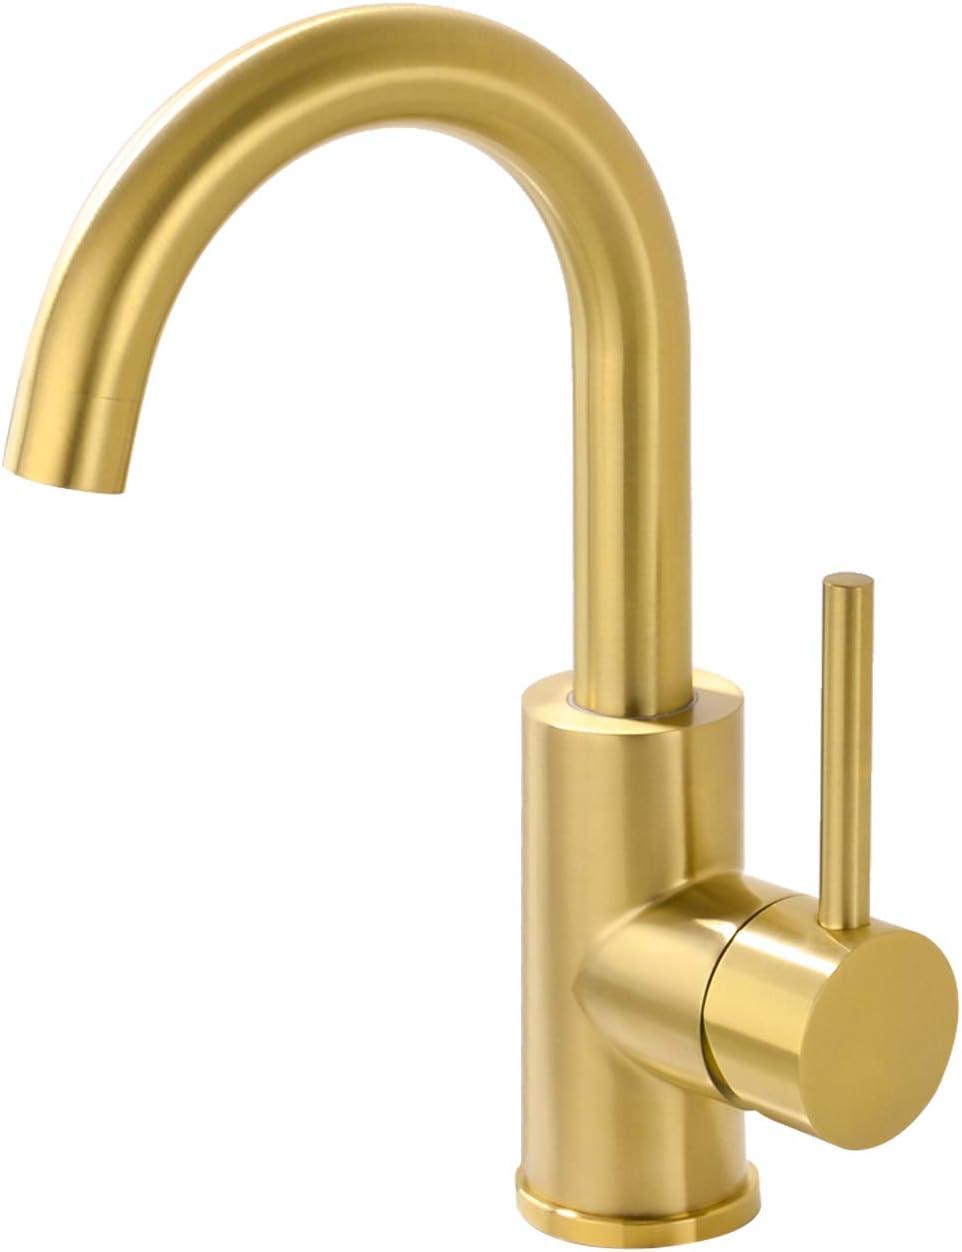 Brushed Gold Kitchen Sink Faucet